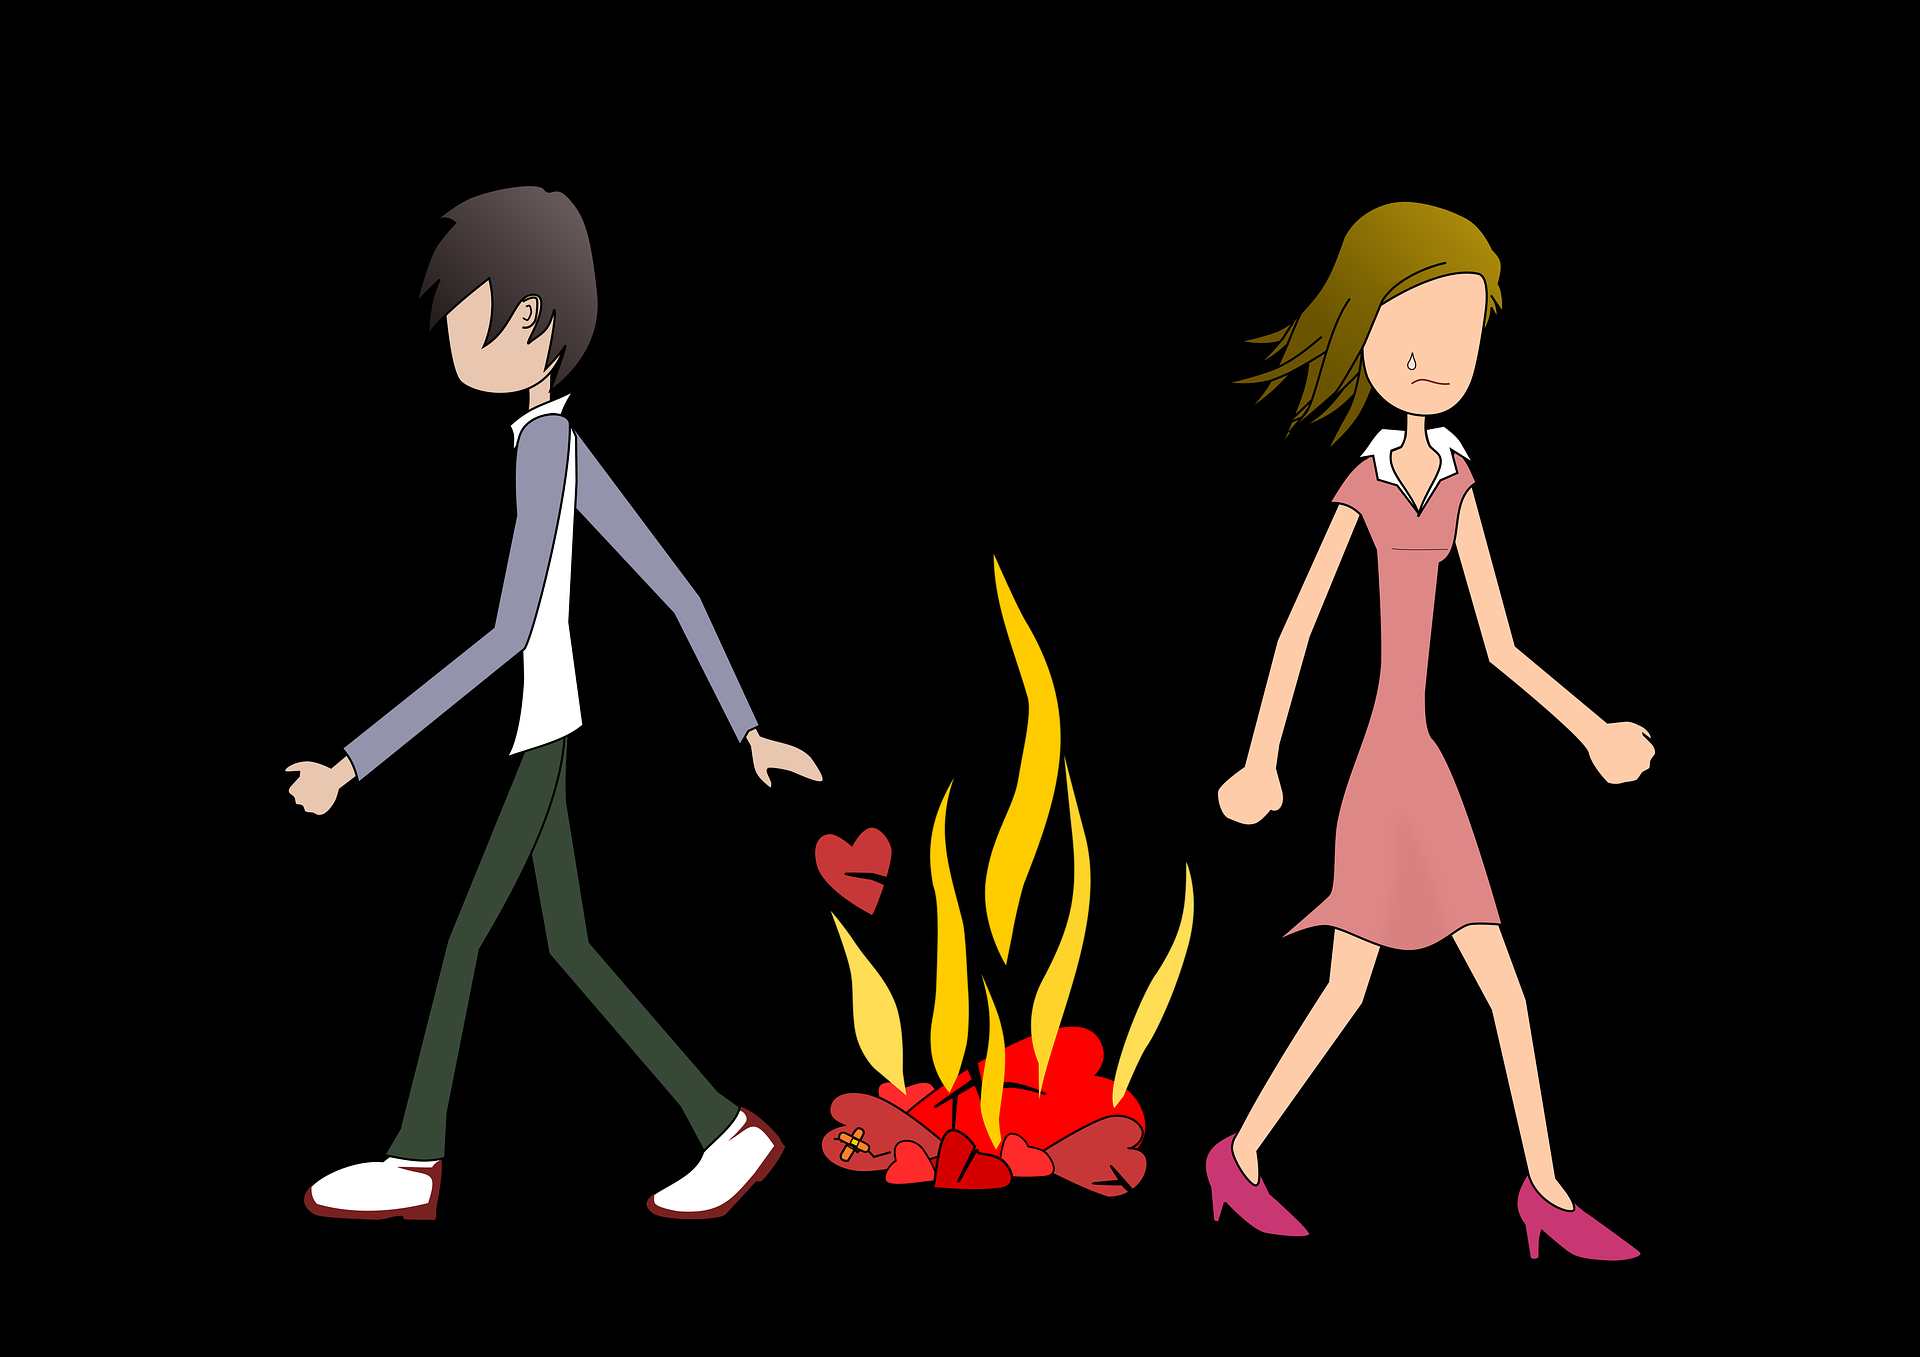 Couple Breaking Up Sad Image Graphics Sad Cartoon Pic Download 1920x1357 Download Hd Wallpaper Wallpapertip